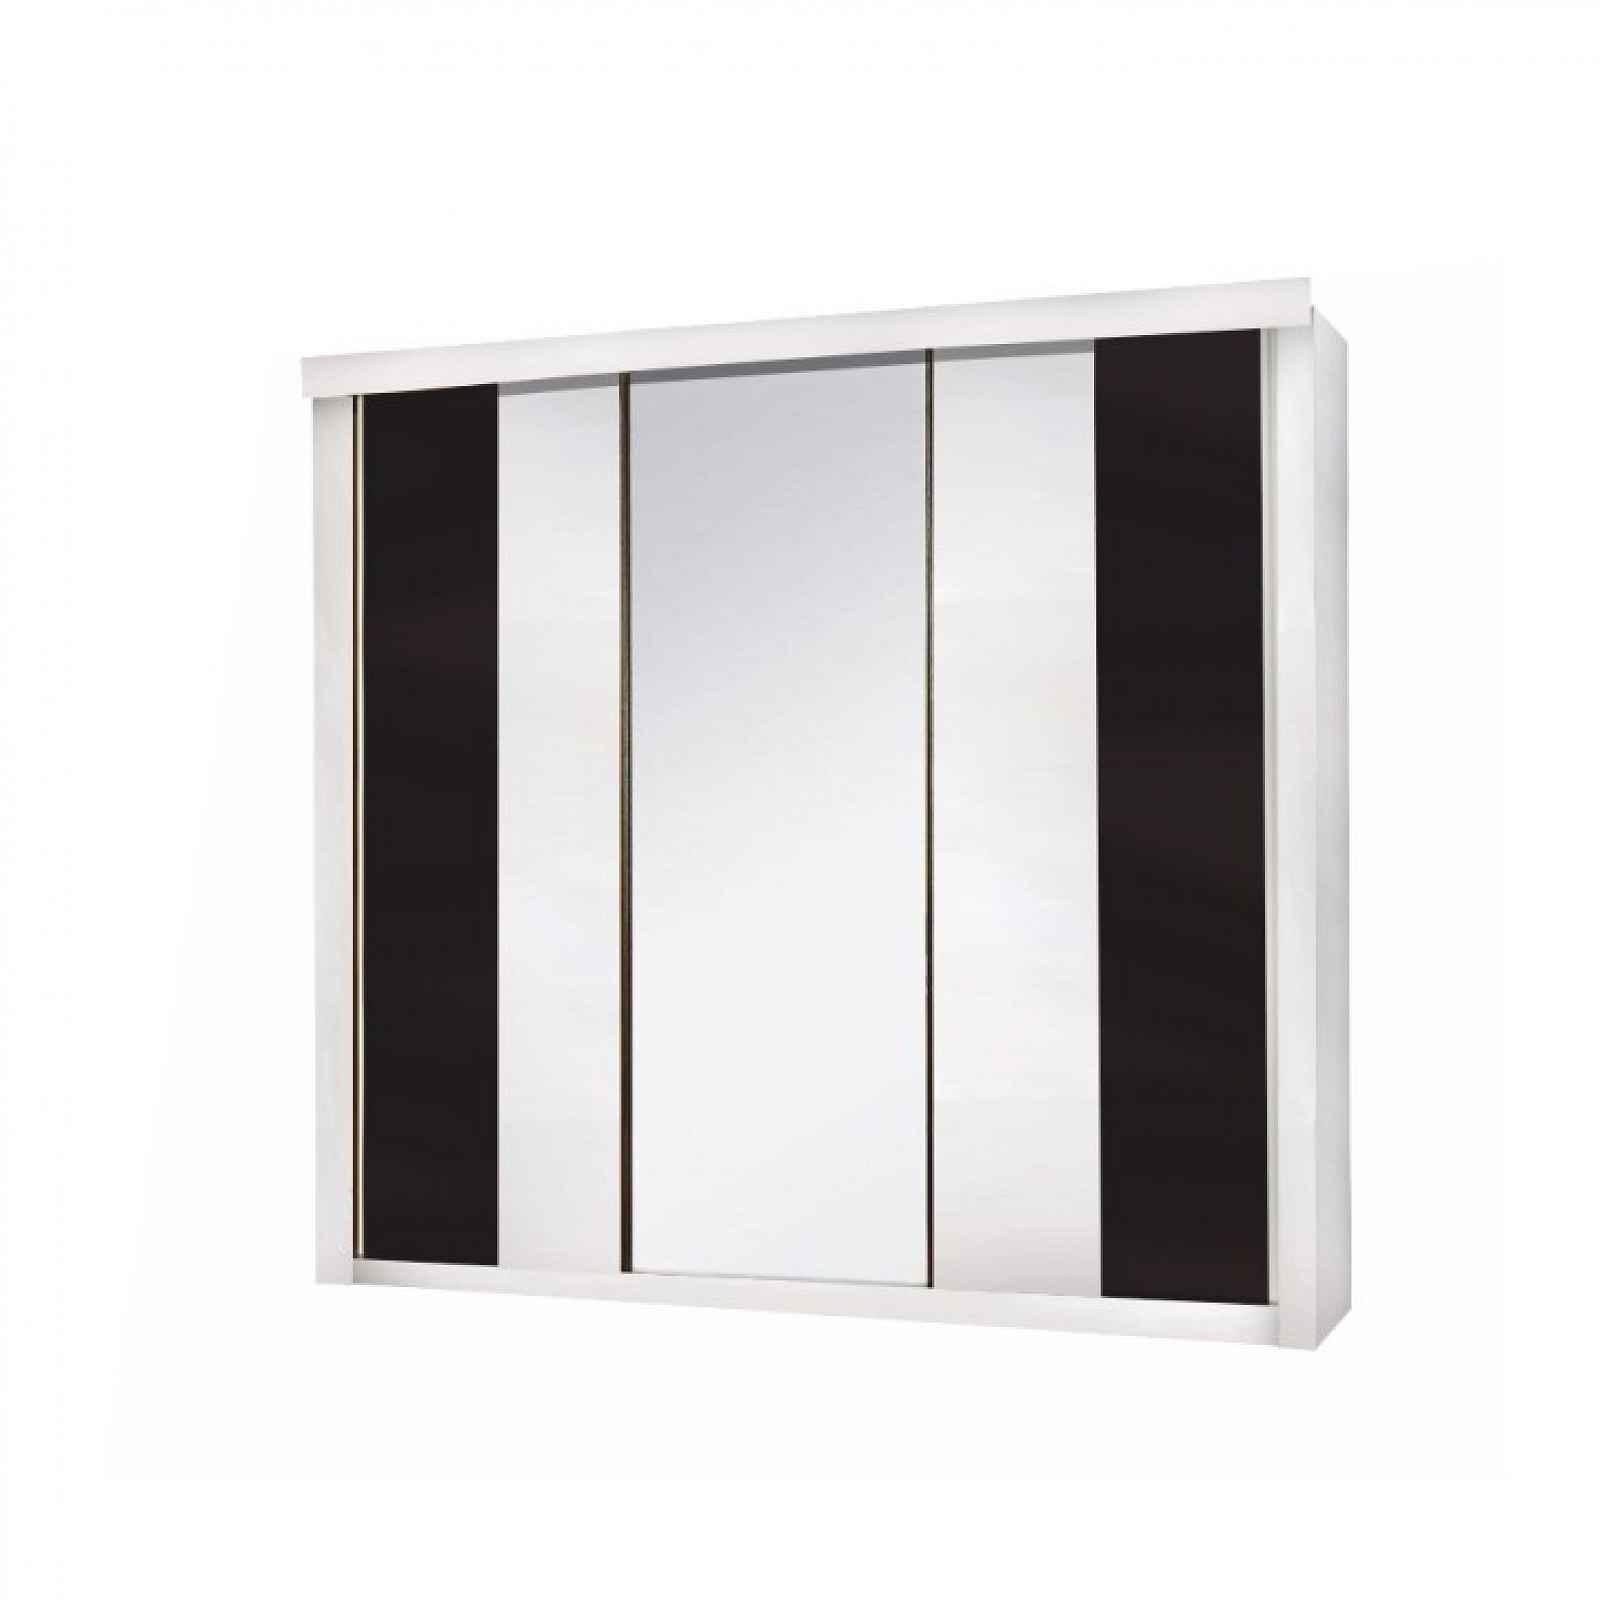 3-dveřová skříň, bílá / černá, RUBLIN 0000237379 Tempo Kondela